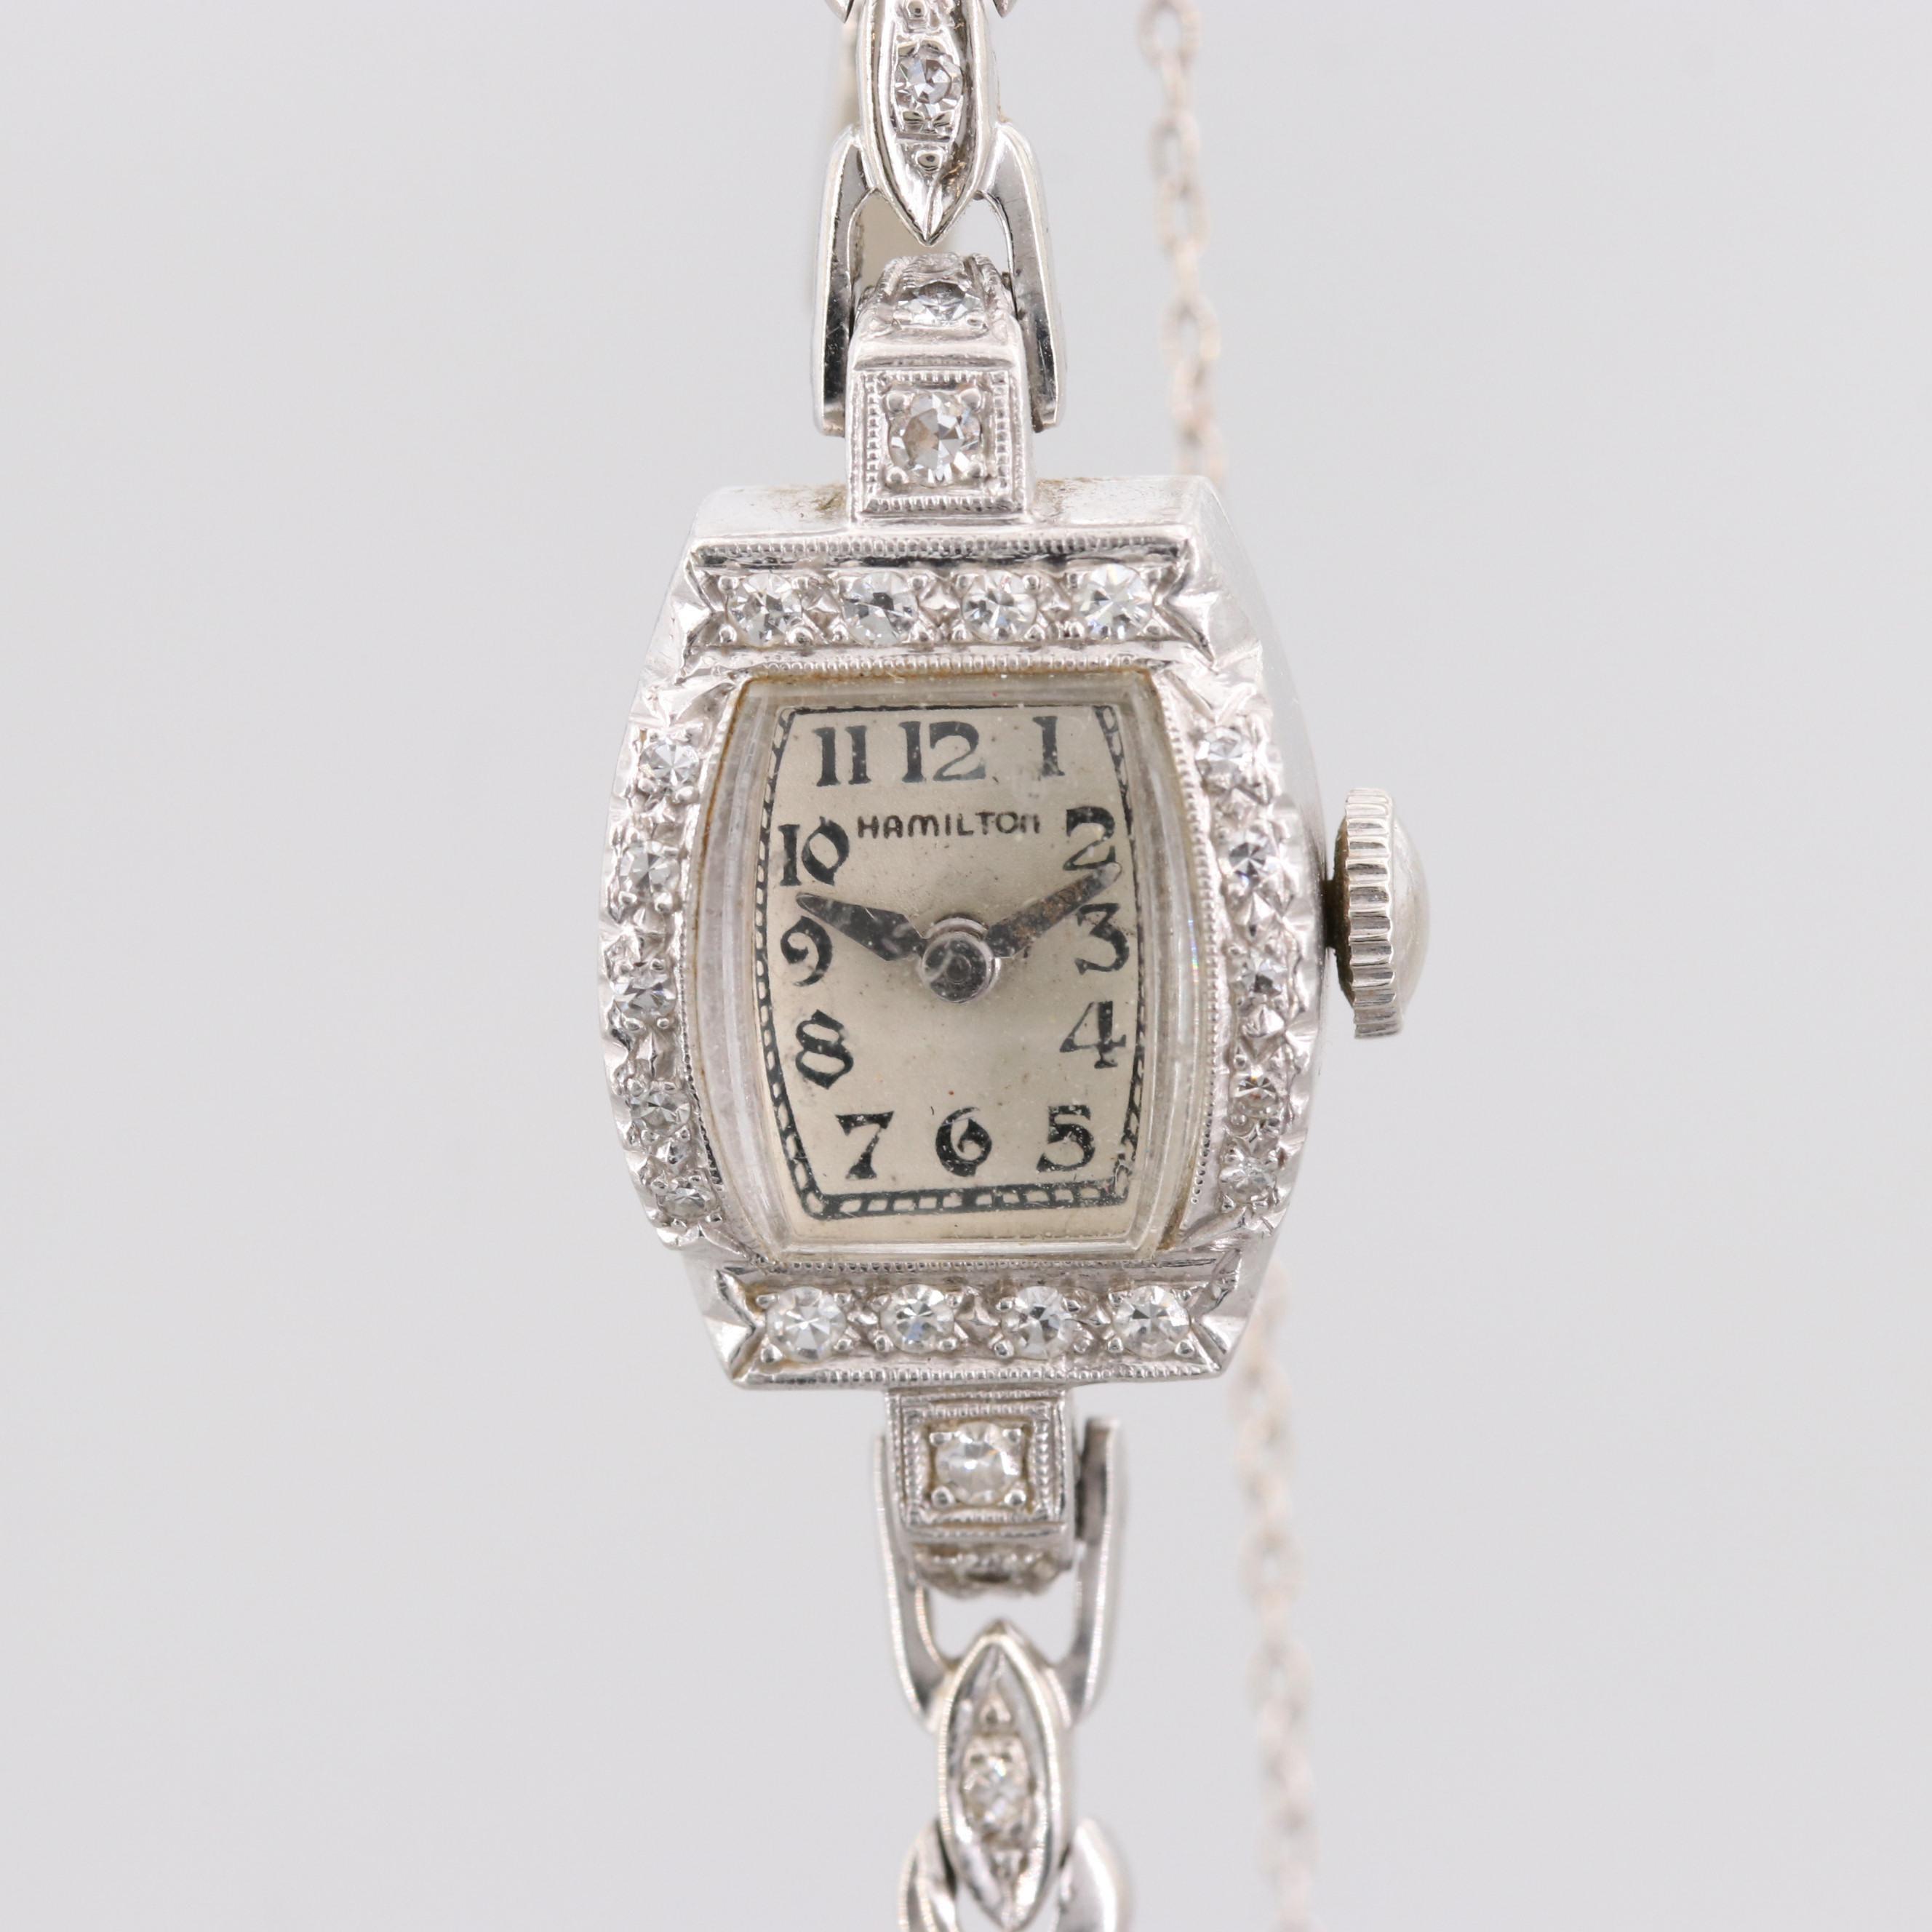 Hamilton Platinum and Diamond Wristwatch With 14K White Gold and Diamond Band